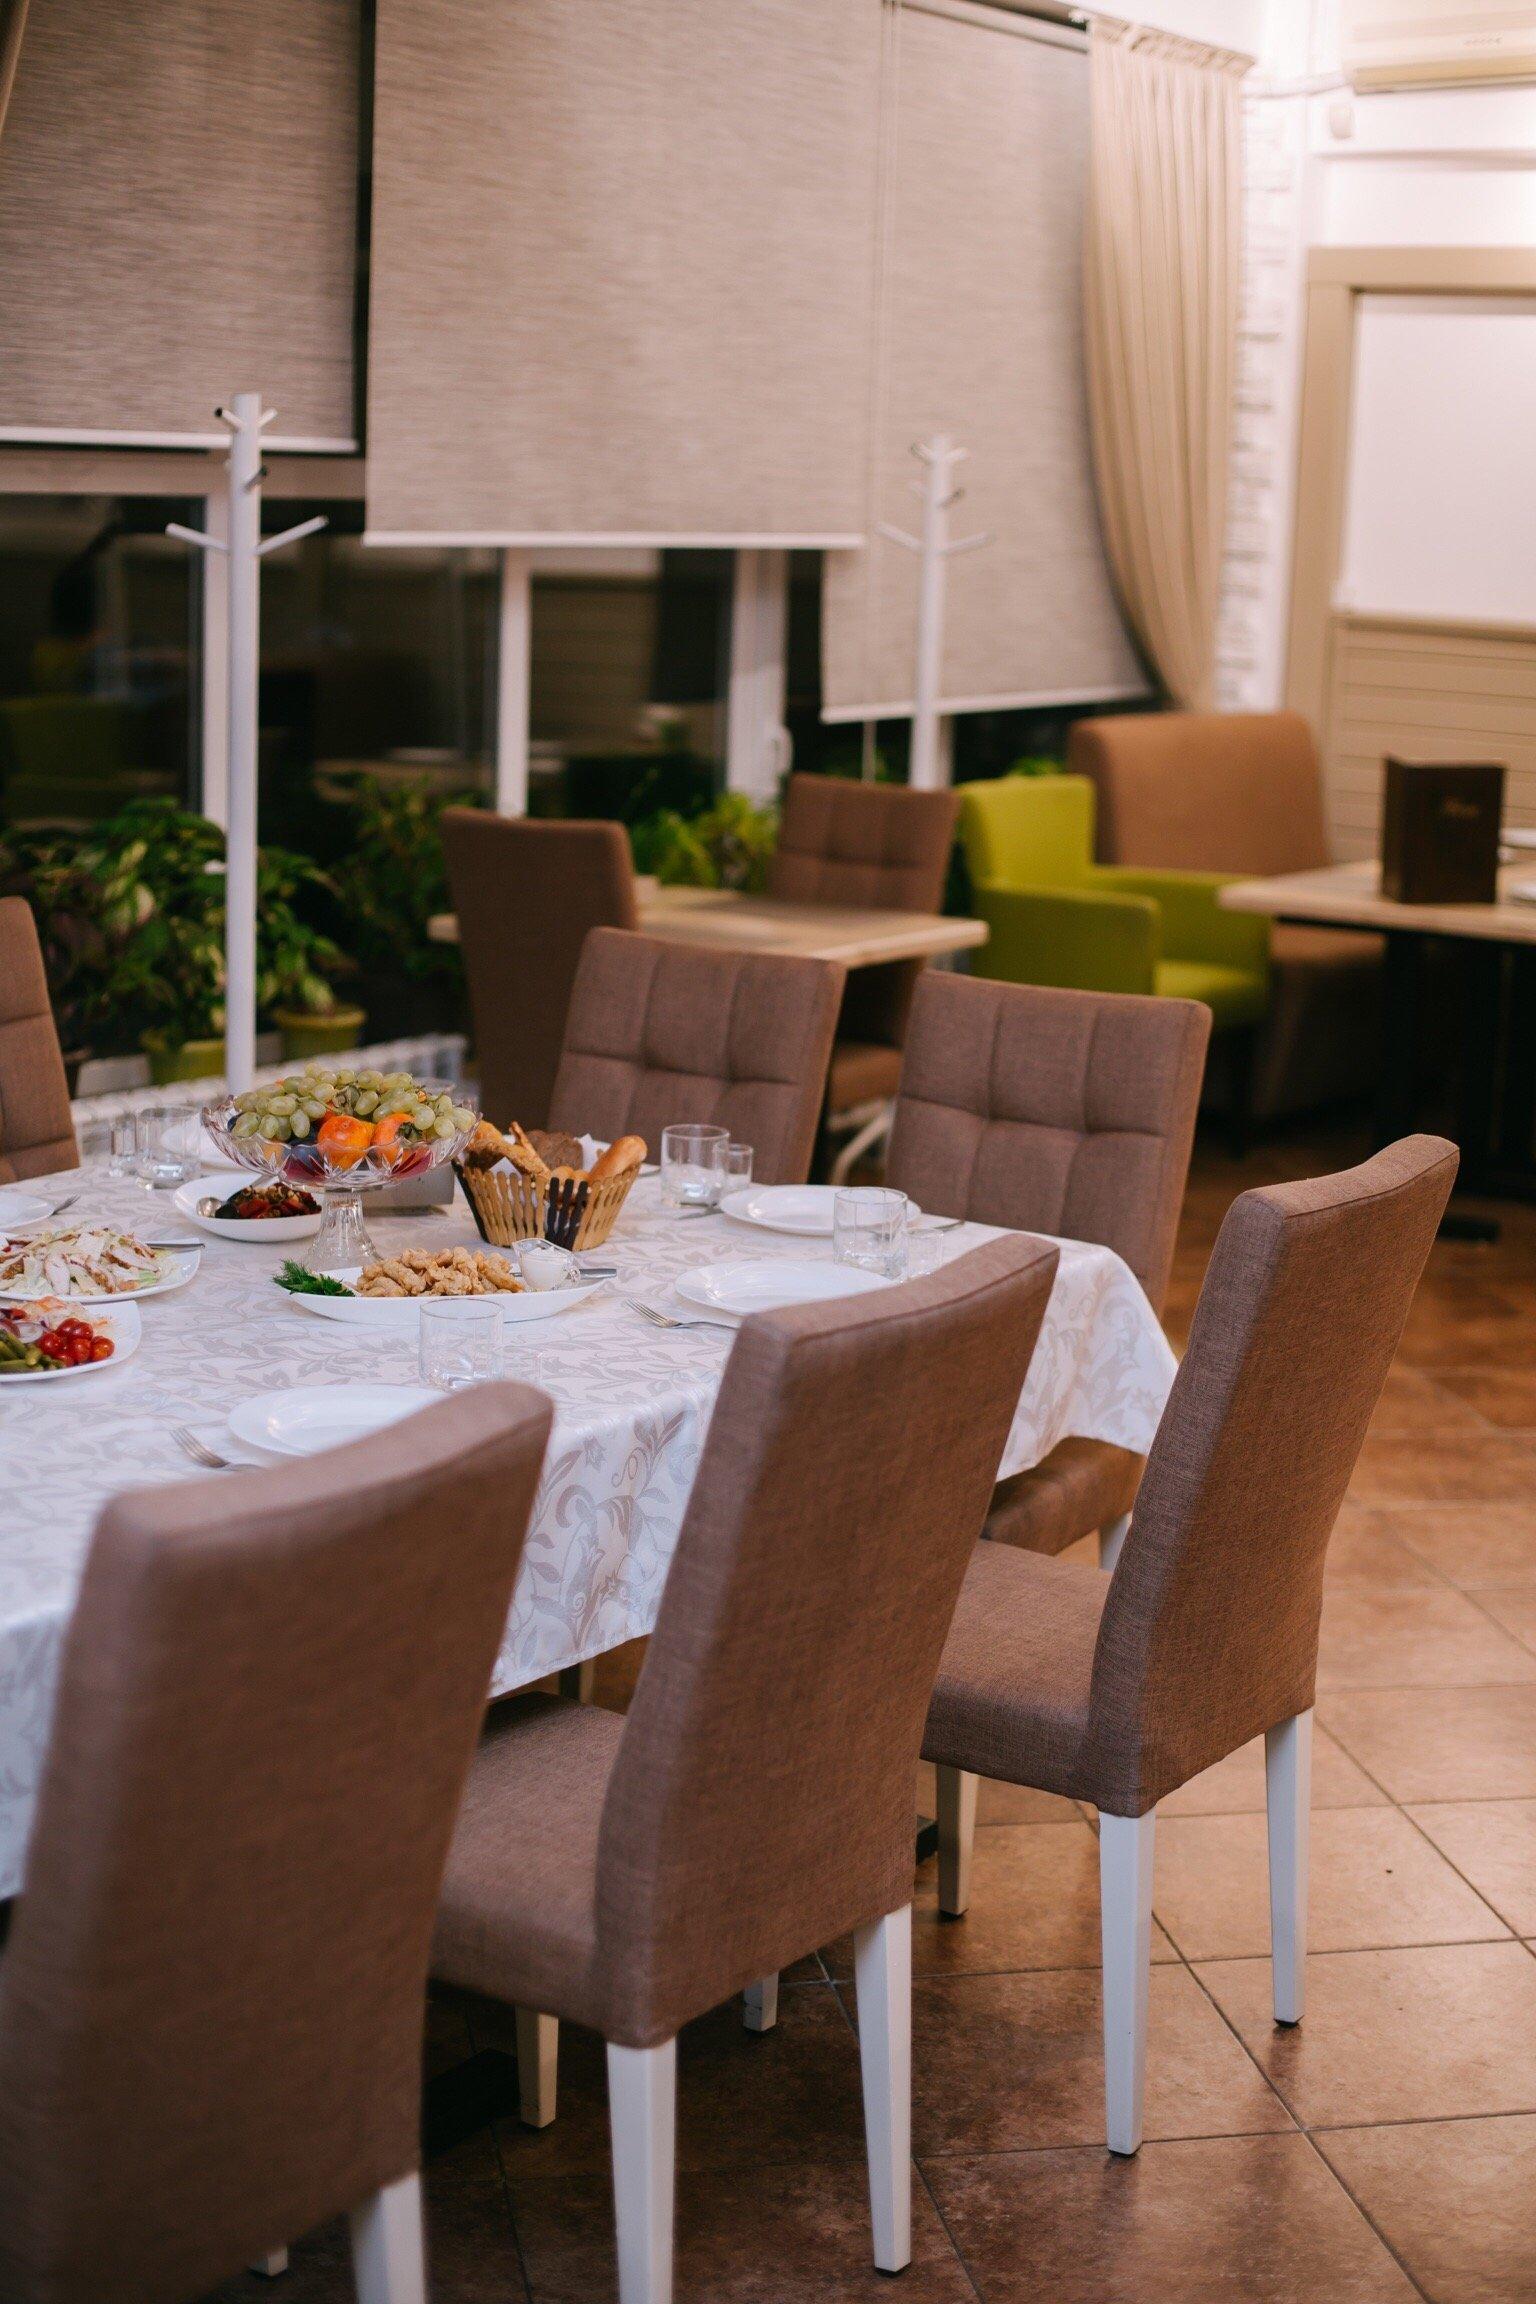 Things To Do in Caucasian, Restaurants in Caucasian